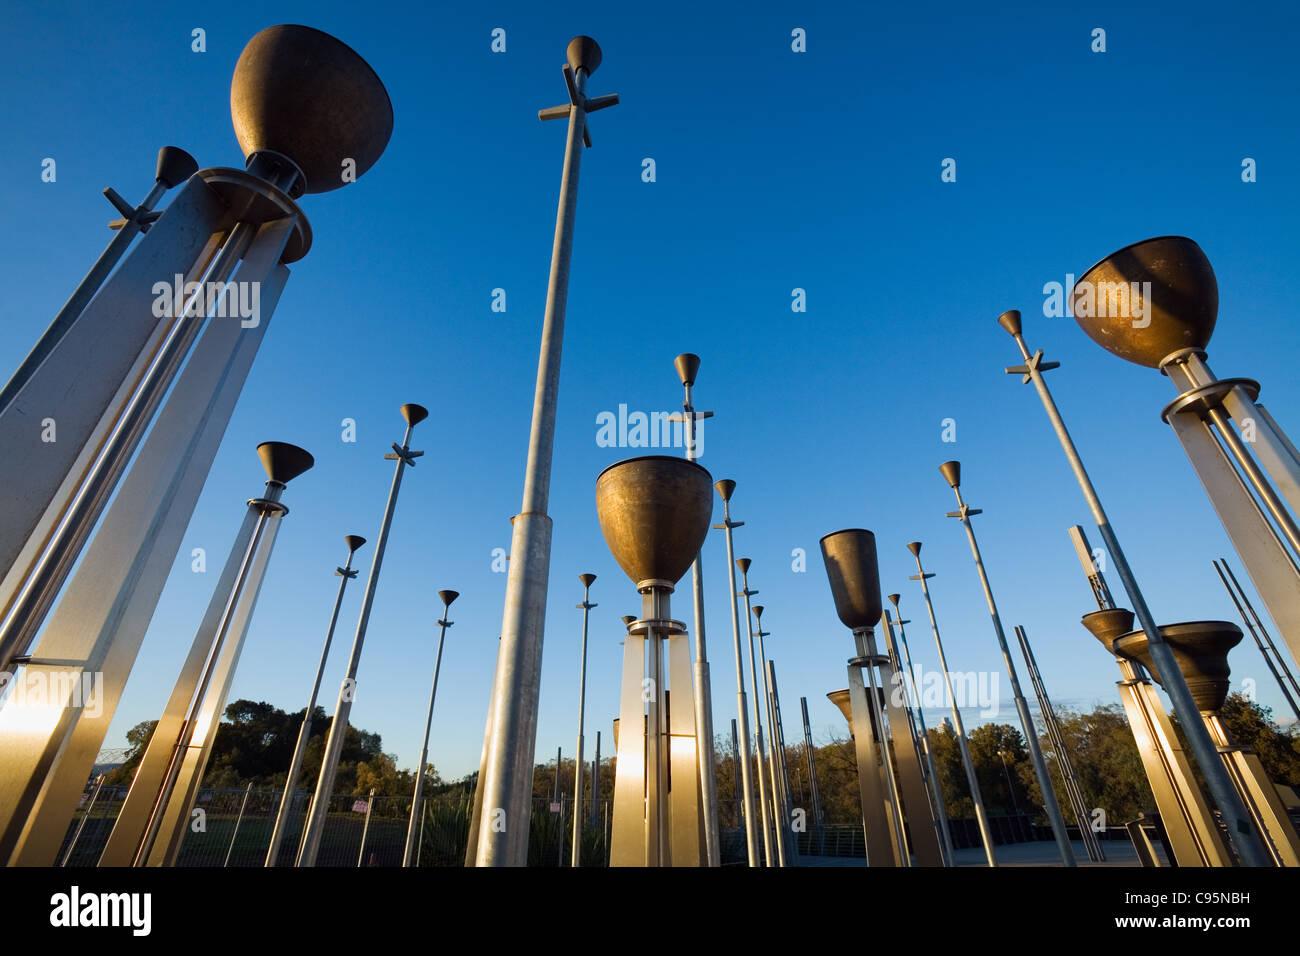 The Federation Bells in Birrarung Marr Park.  Melbourne, Victoria, Australia - Stock Image